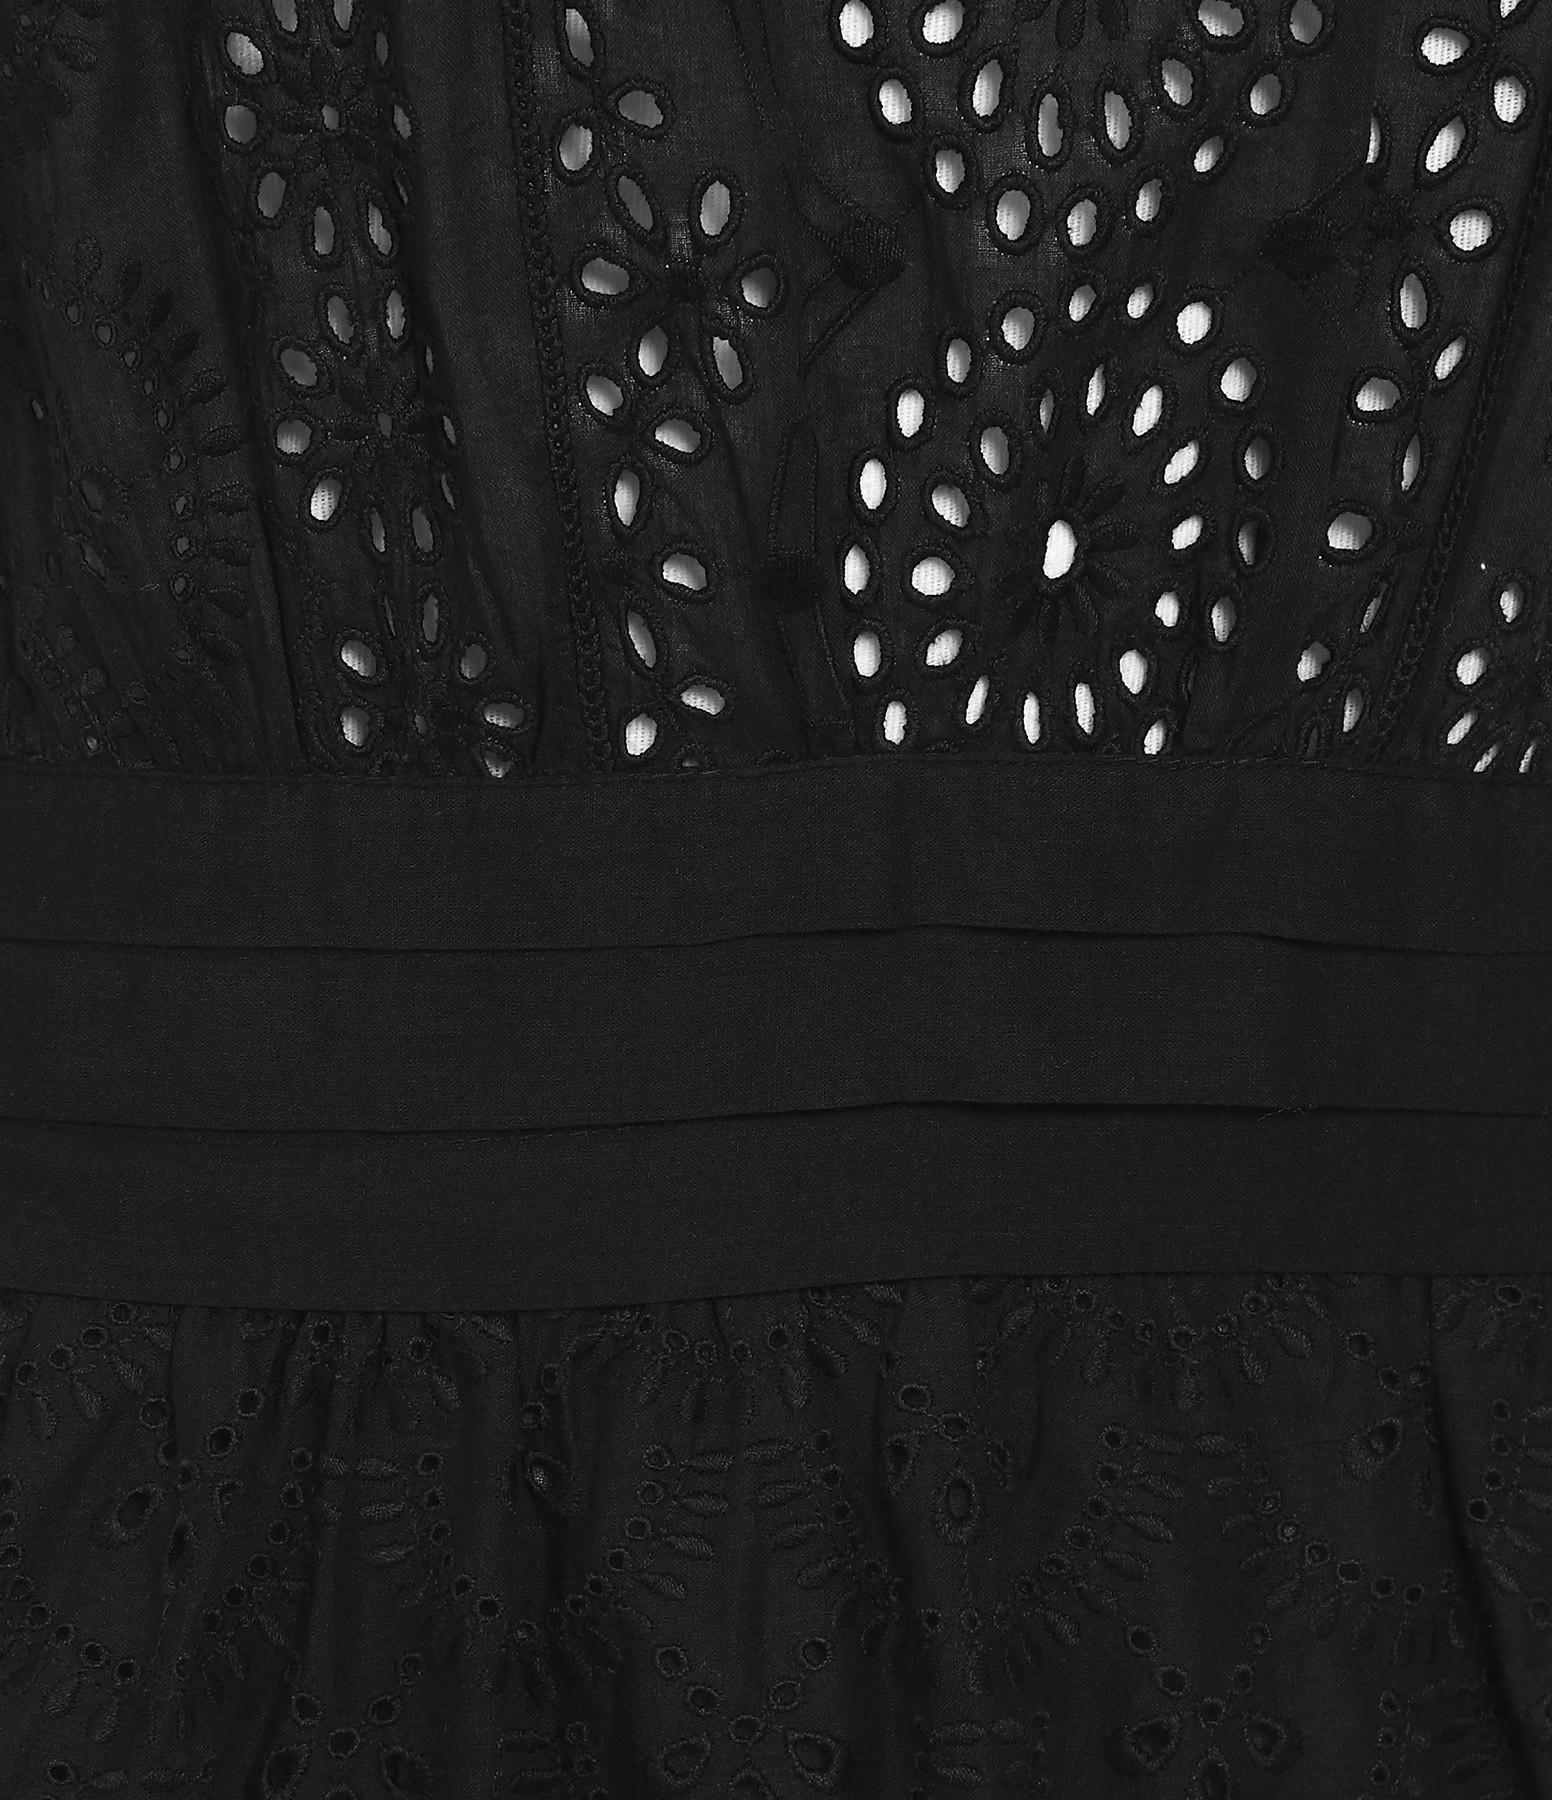 VANESSA BRUNO - Robe Jolane Noir